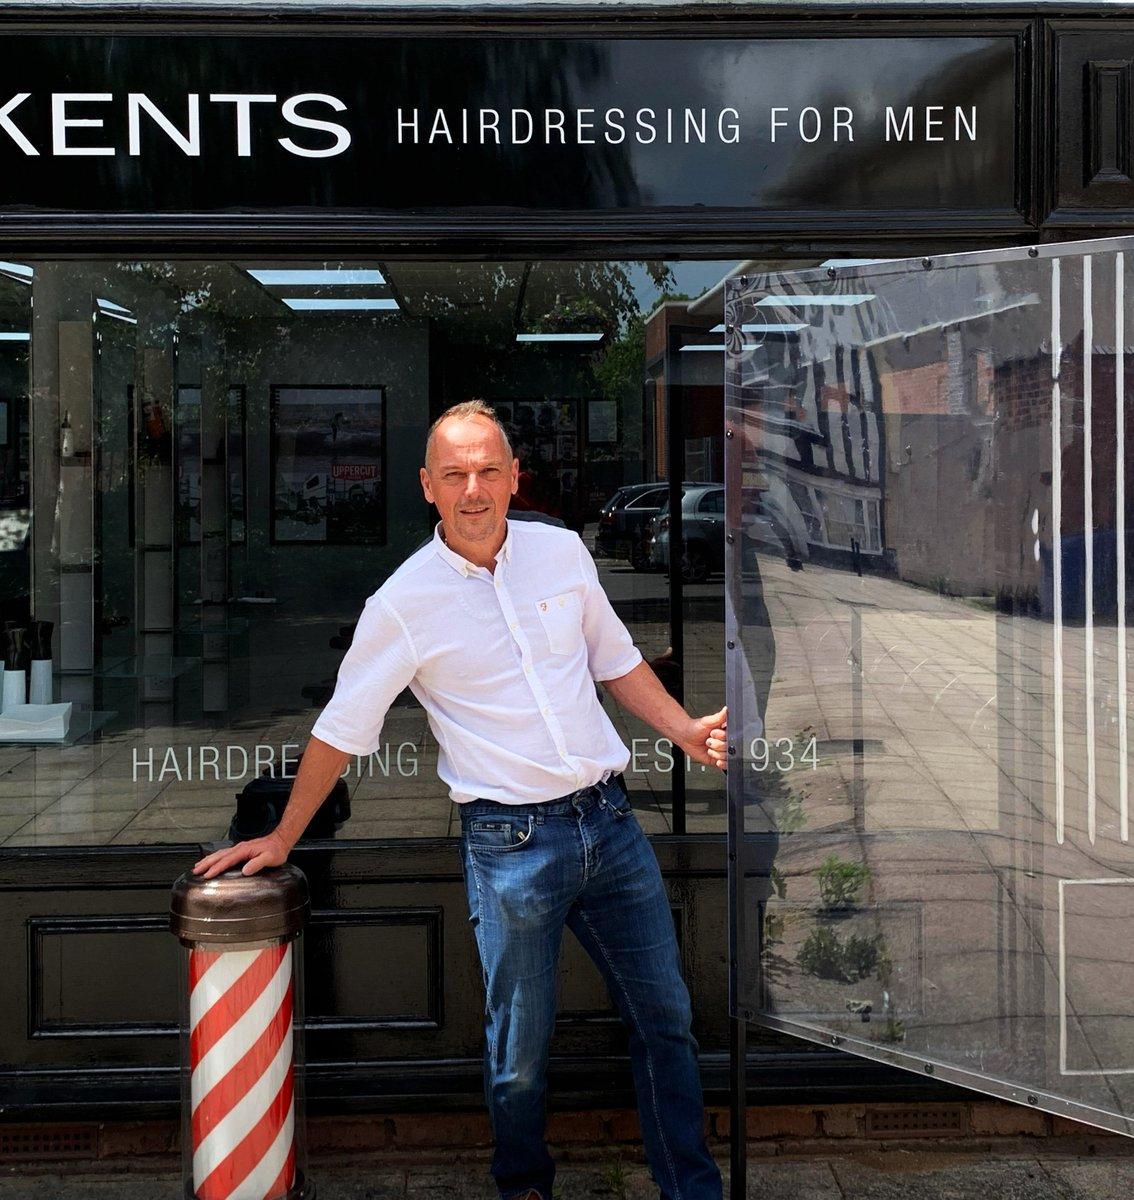 Barber's Handy Screen takes off! #barbershop #hairdresserpic.twitter.com/iMzmC1KZhf